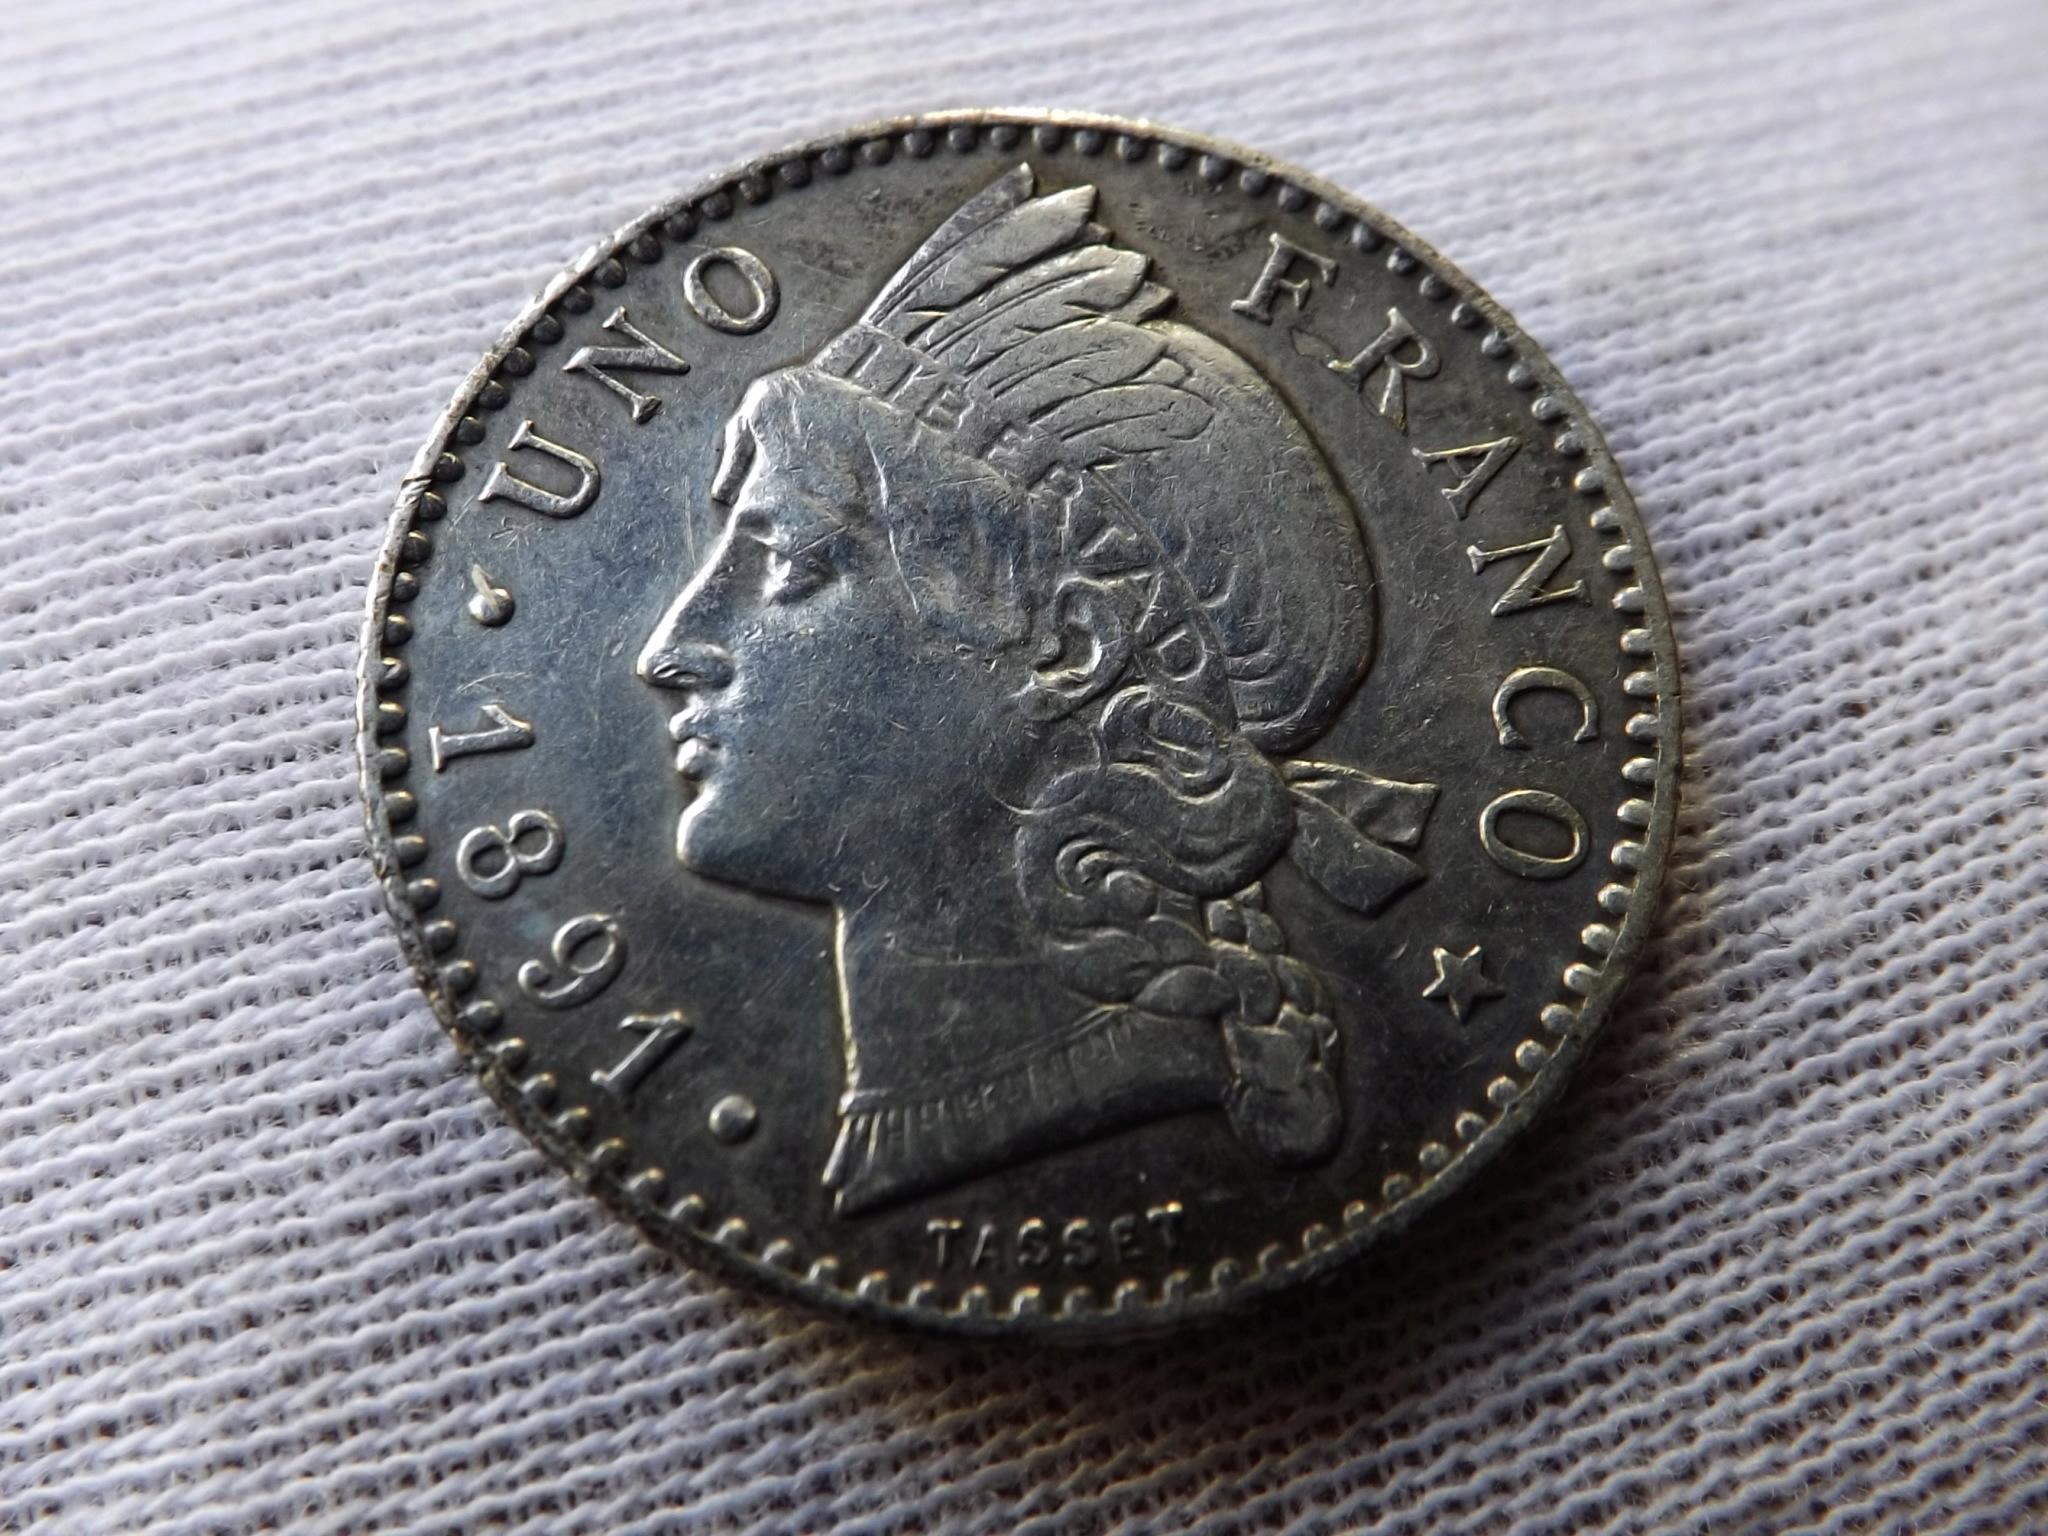 1 Franco de la República Dominicana de 1.891. Dscf6416